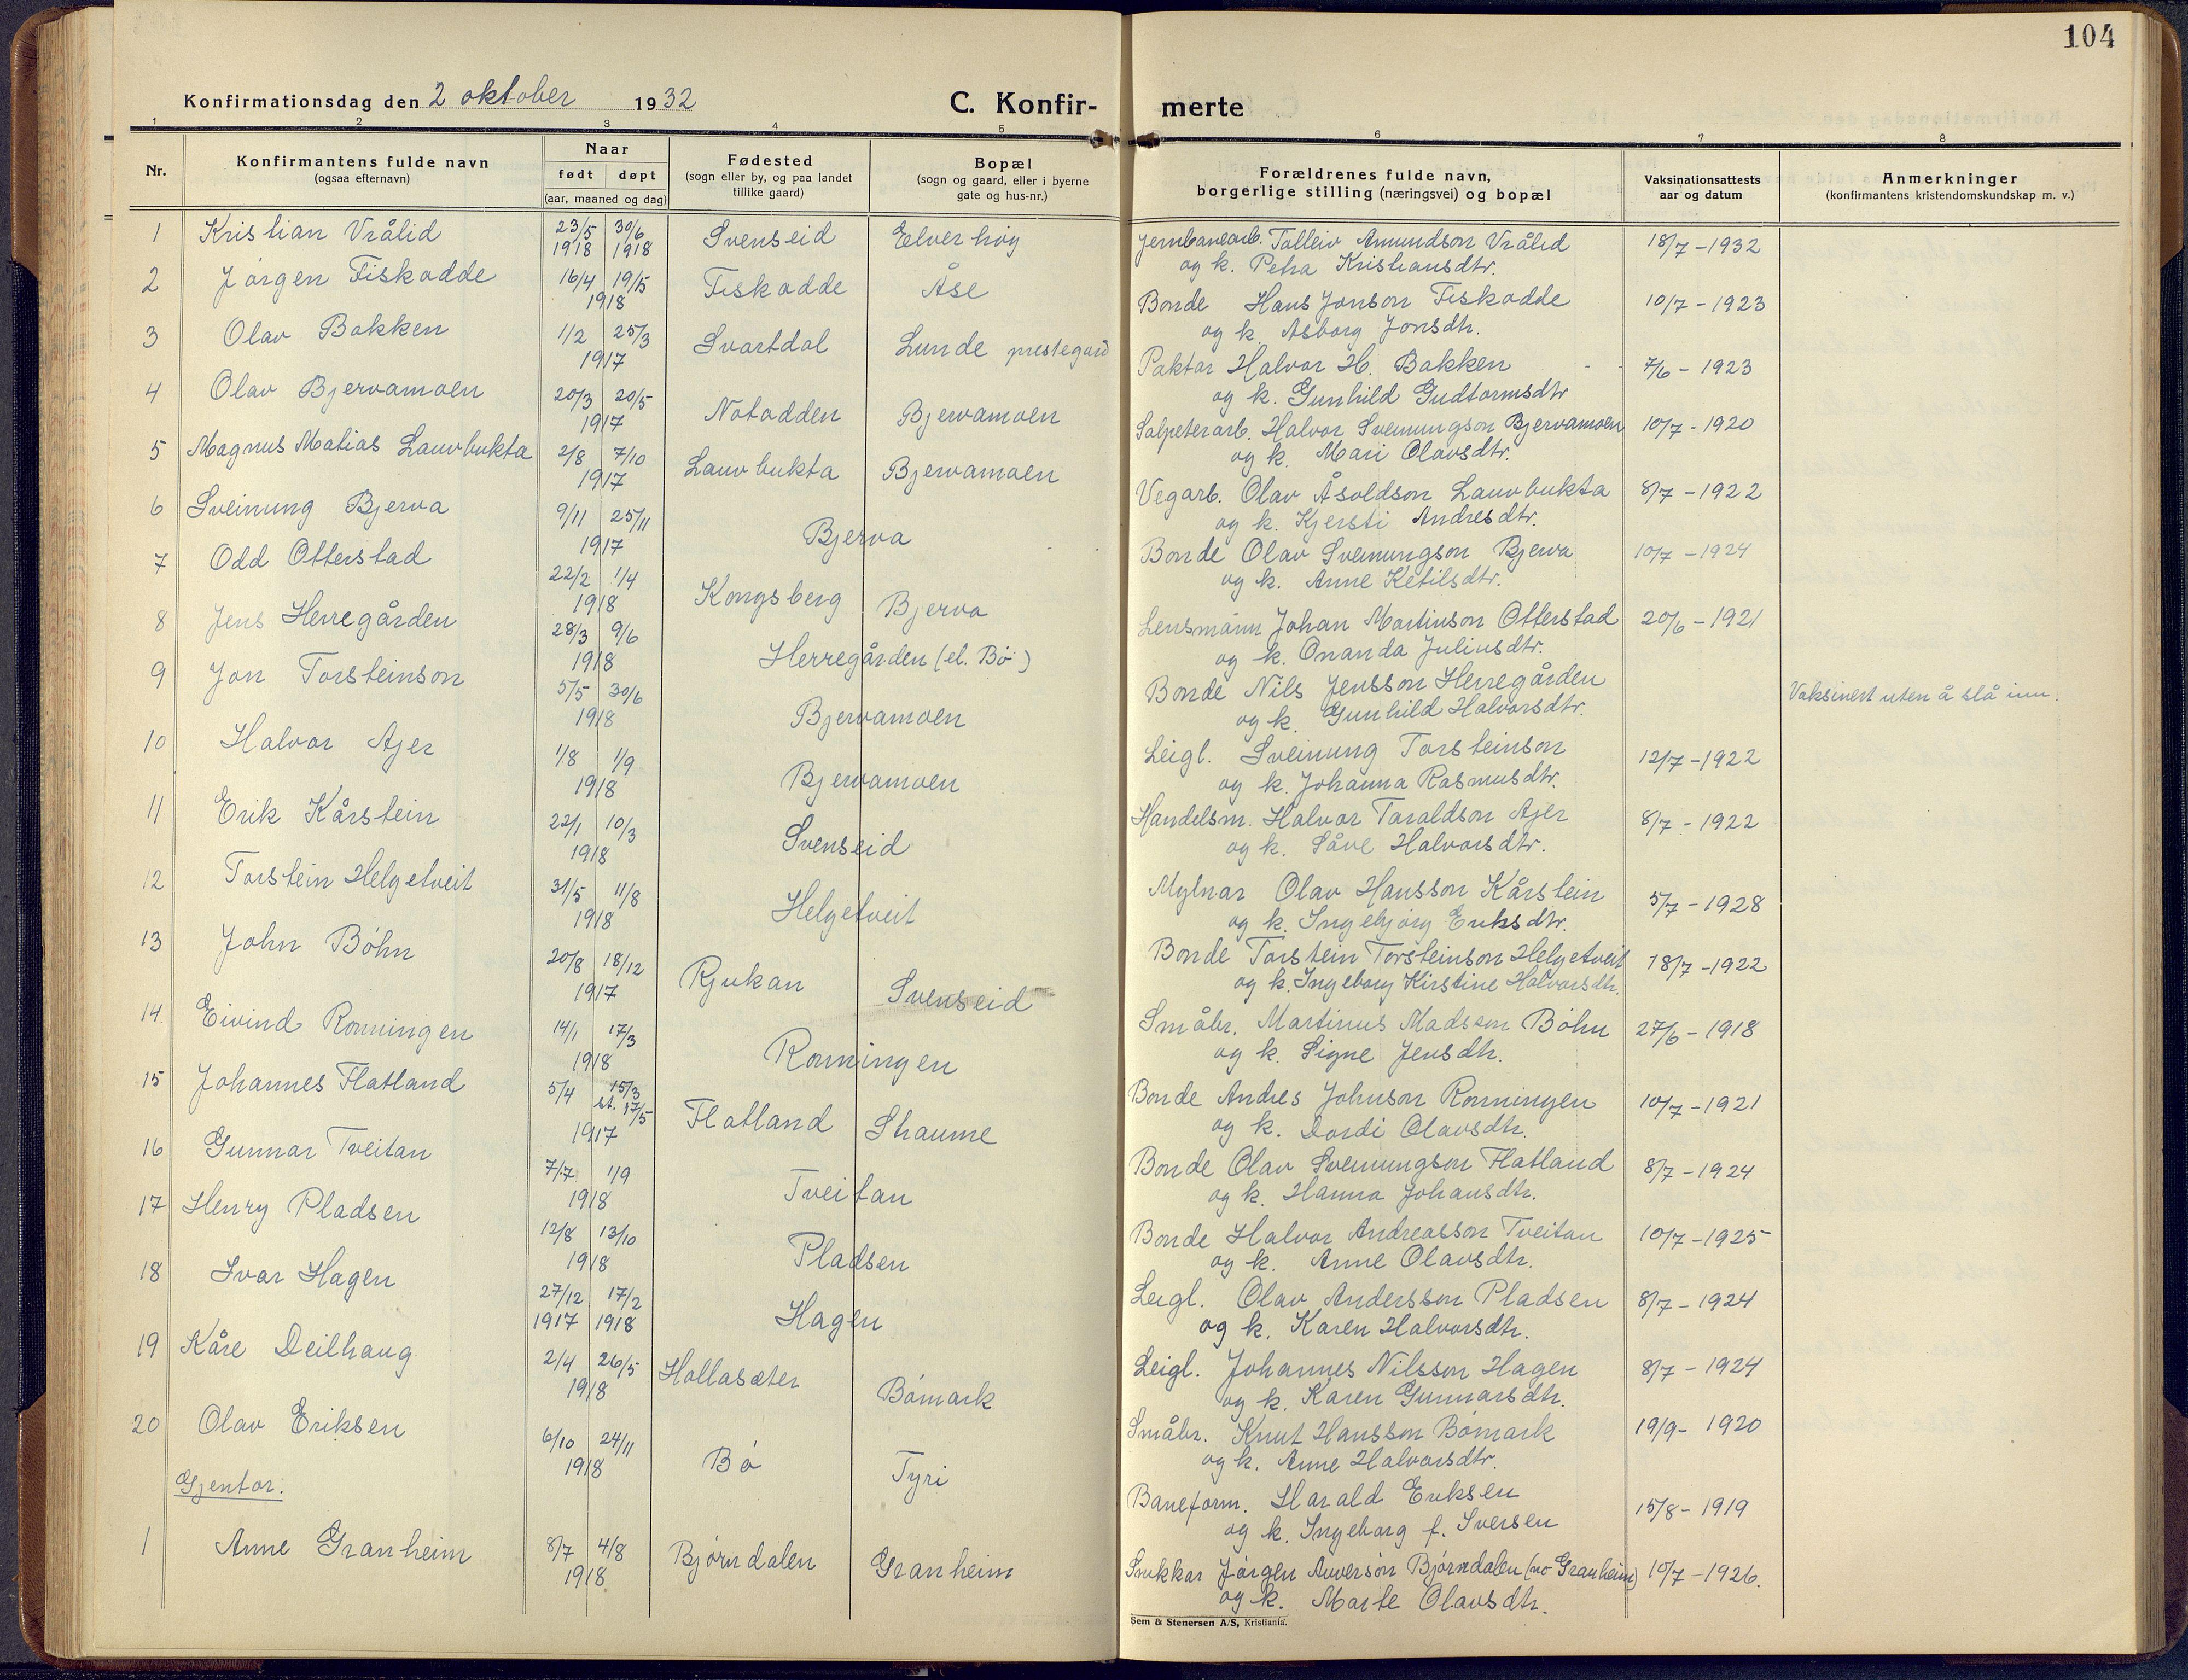 SAKO, Lunde kirkebøker, F/Fa/L0006: Ministerialbok nr. I 6, 1922-1940, s. 104